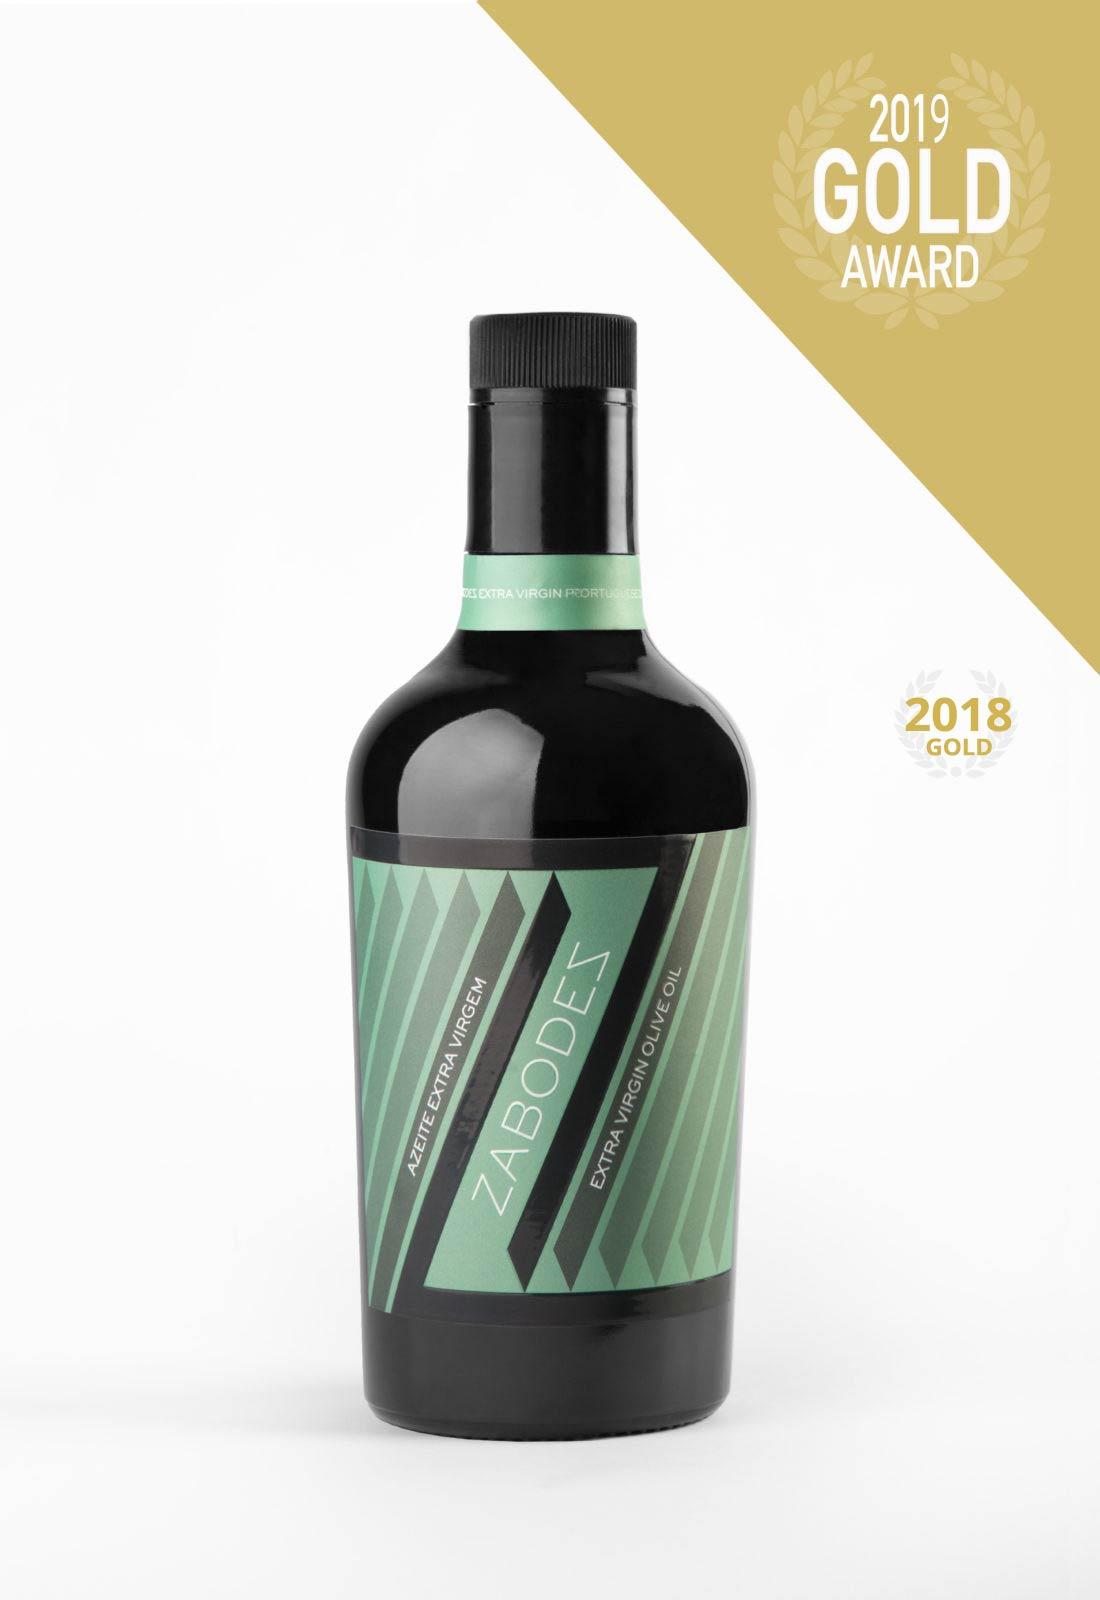 'Zabodez' Azeite Virgem Extra 0,5l - Olivenöl, Qt dos Lagares